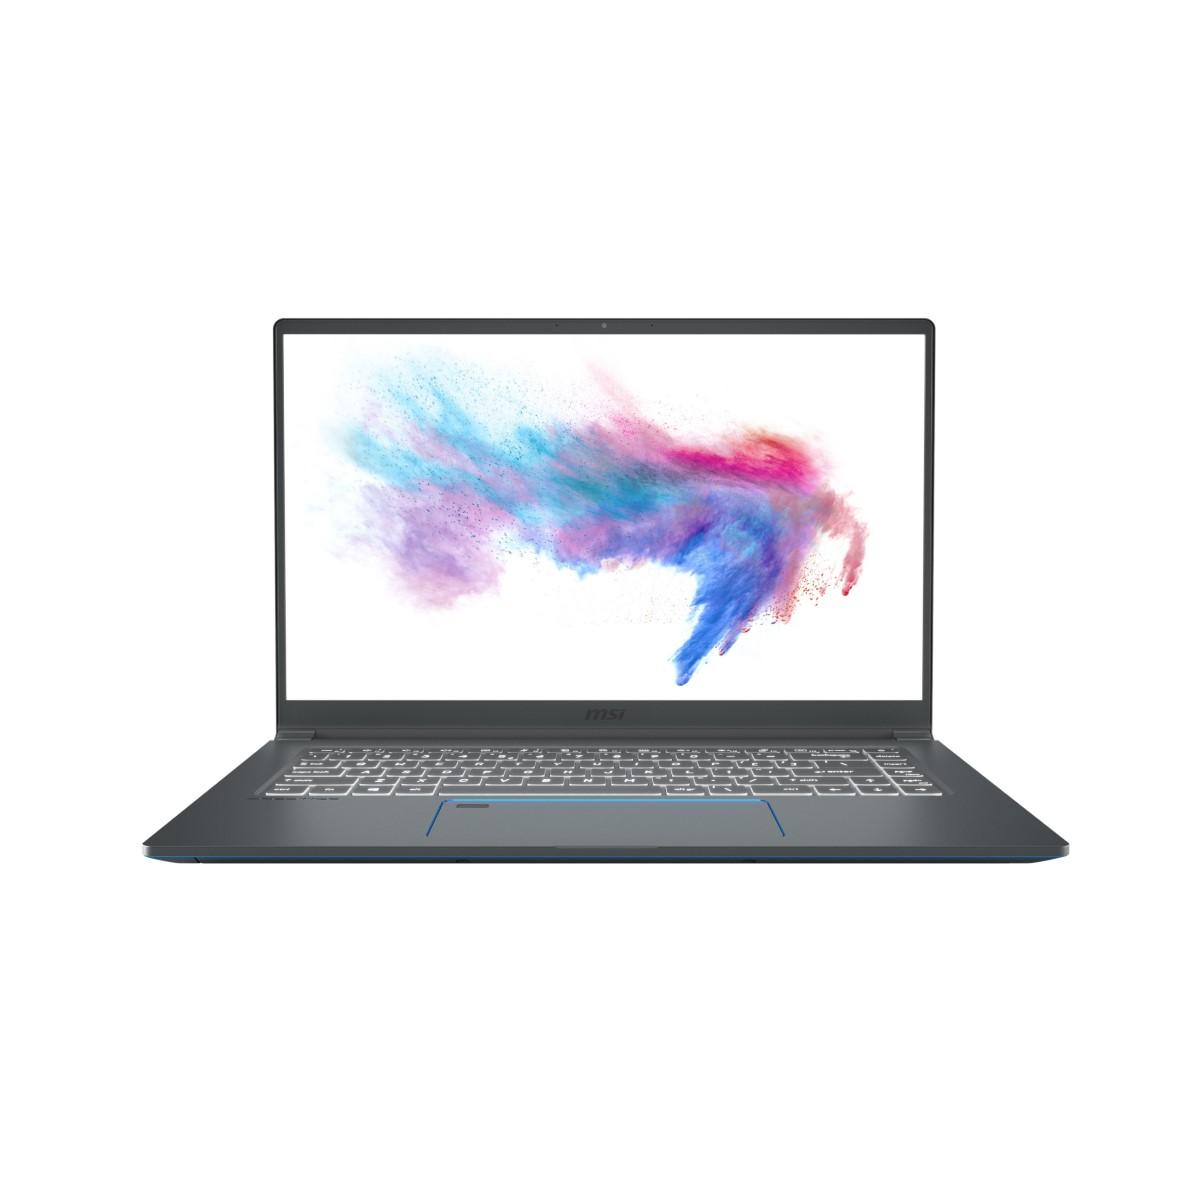 "MSI Prestige 14 10SC Notebook i7-1071OU/16 GB/1 Tb SSD/NVIDIA GeForce GTX 1650 Max-Q 4 GB/14"" FHD/60 Hz/Windows 10/Black"